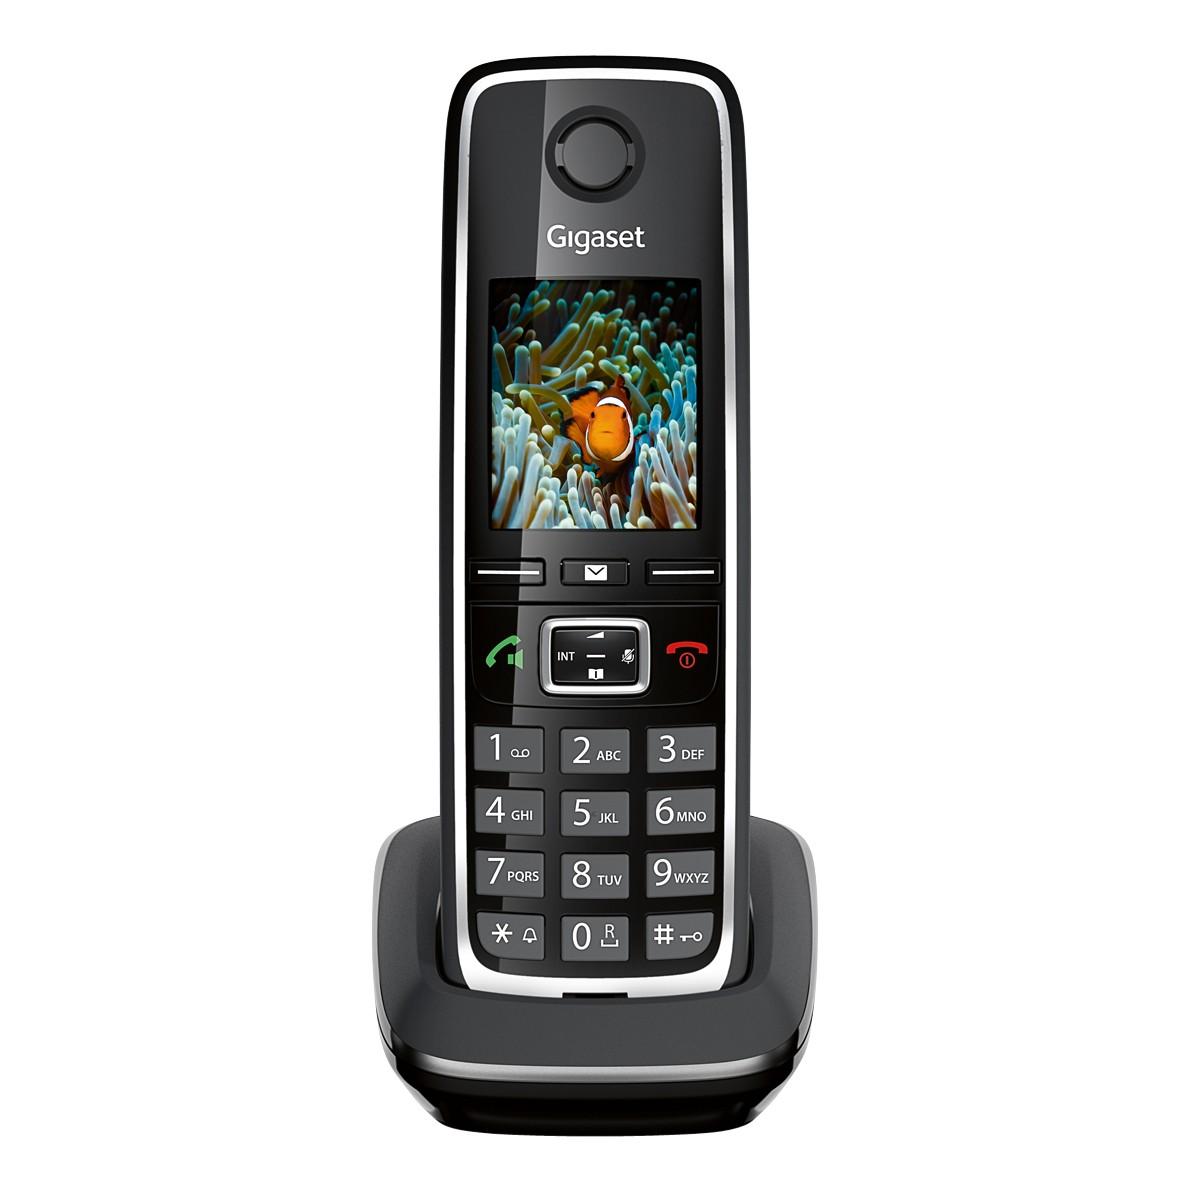 C530h Black Gigaset Mobile Phone